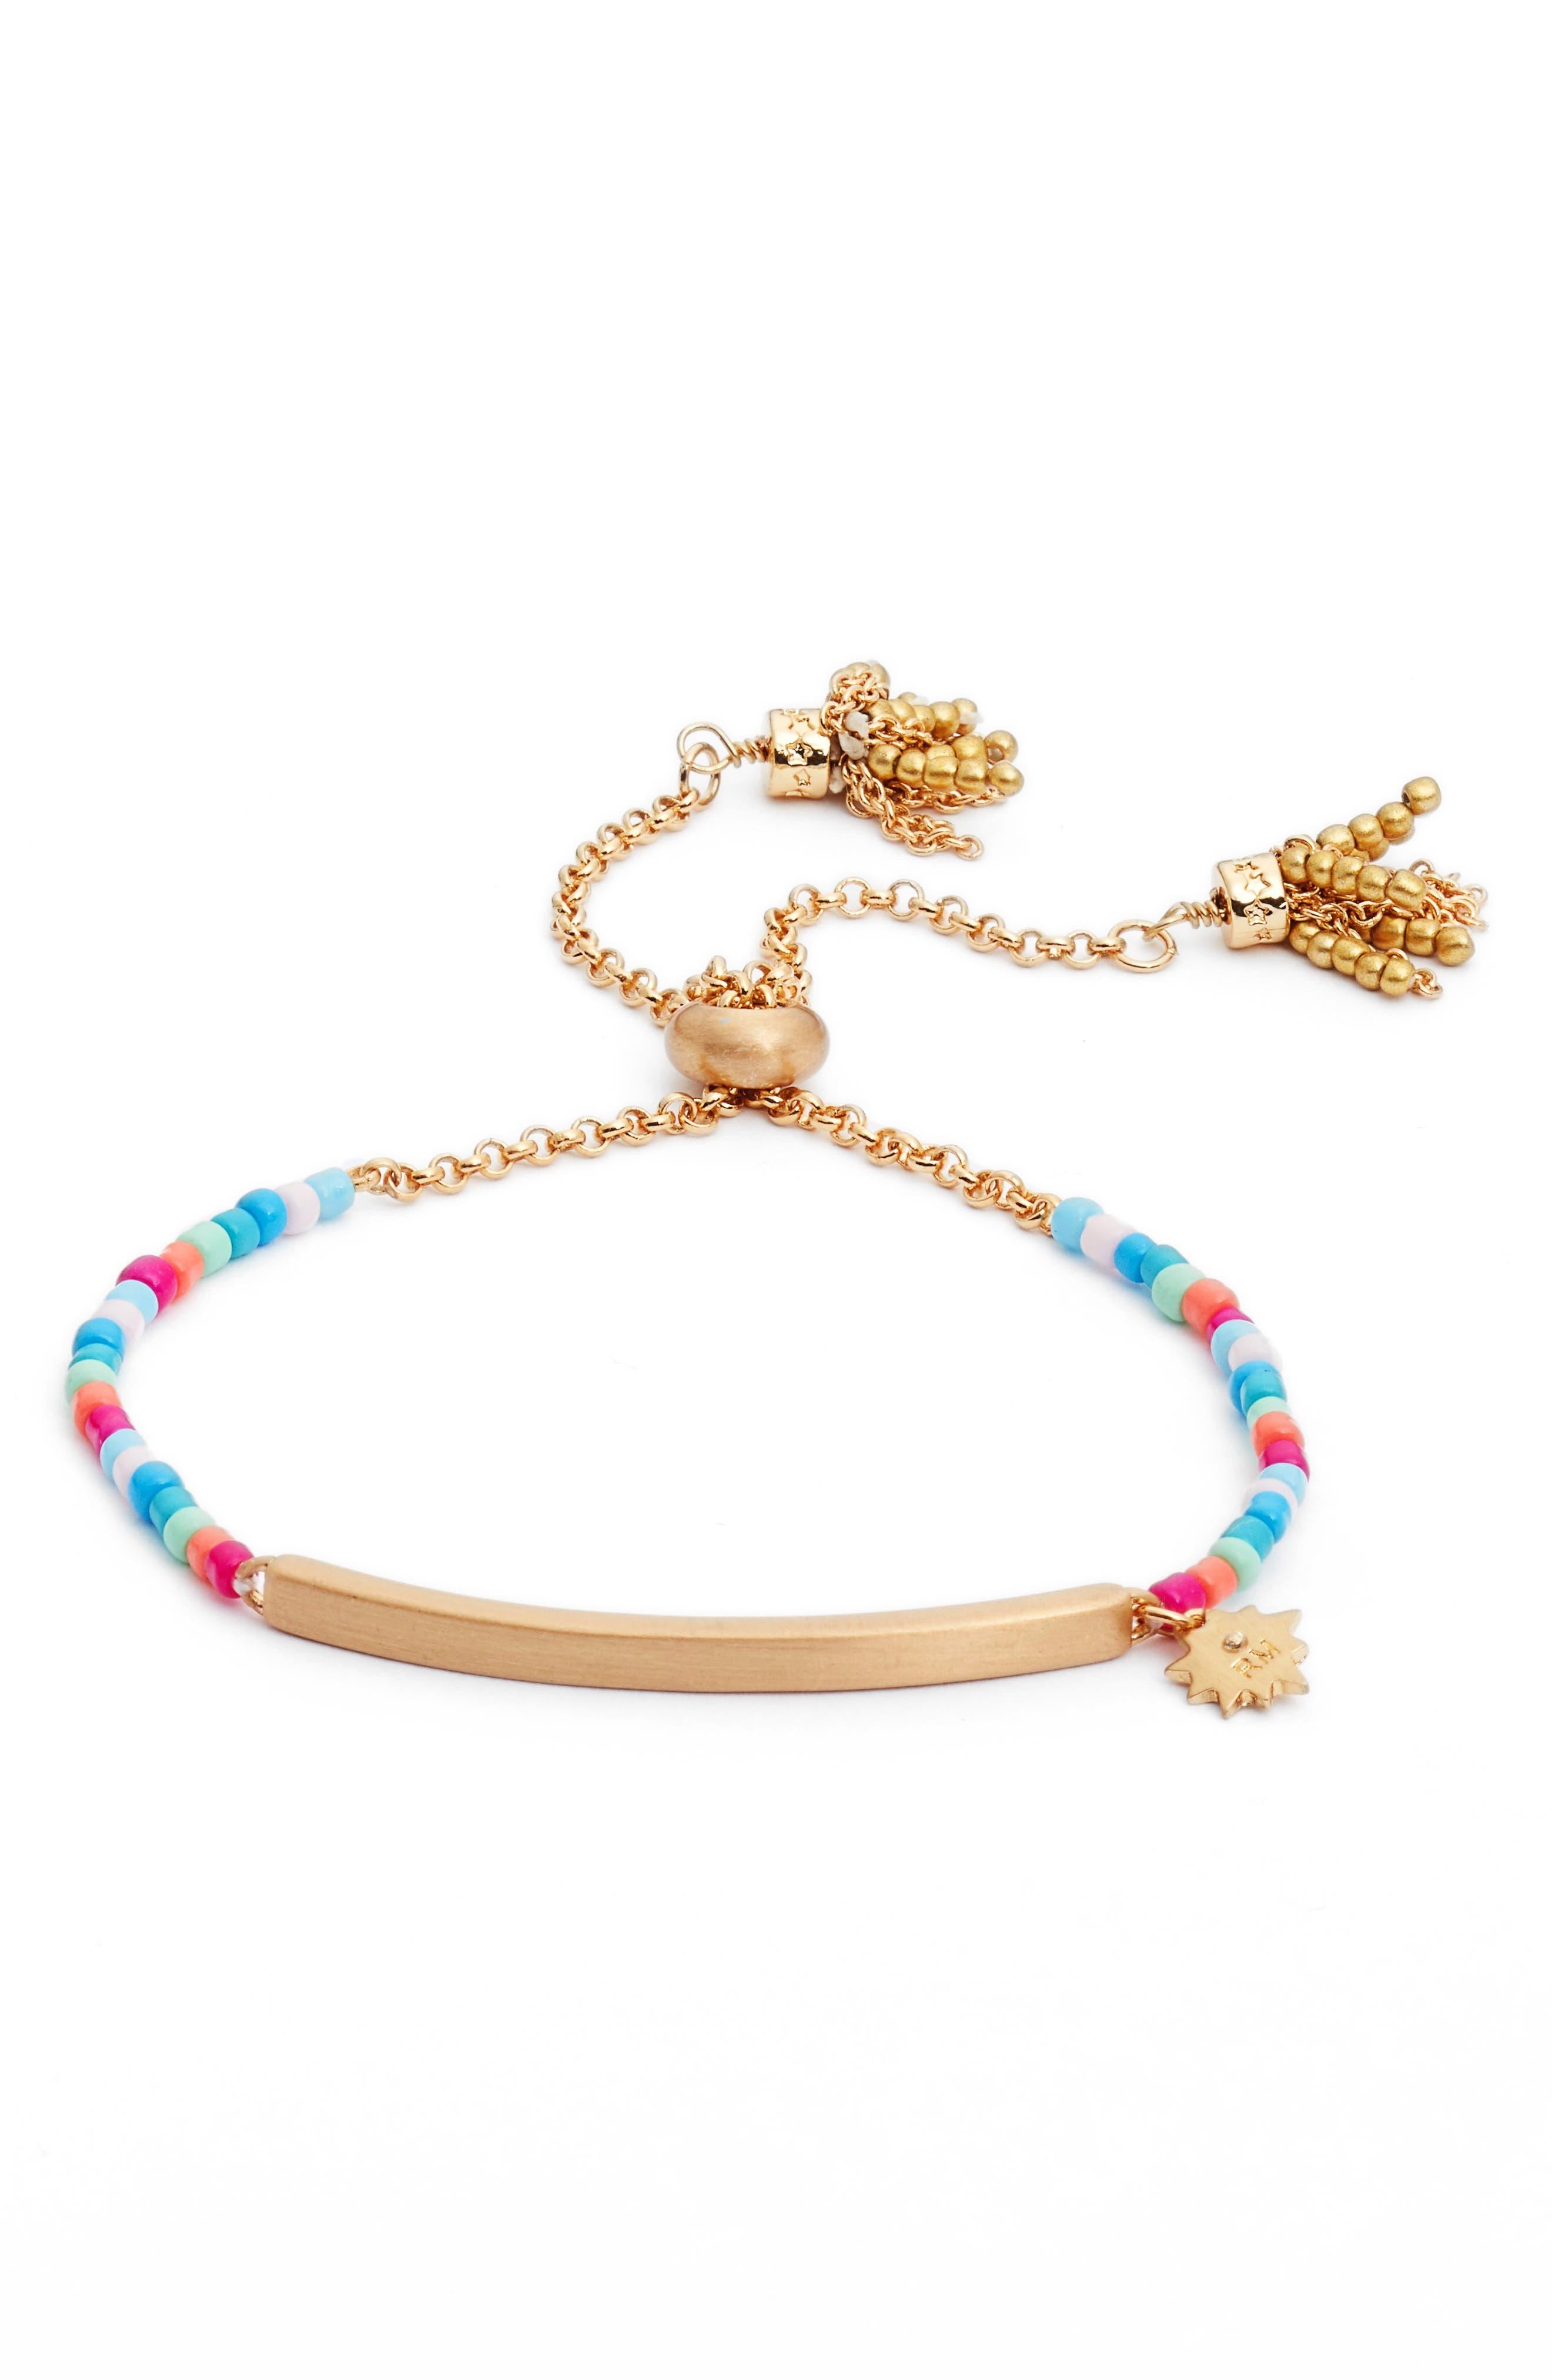 Sole Beaded Adjustable Bracelet,                             Main thumbnail 1, color,                             710